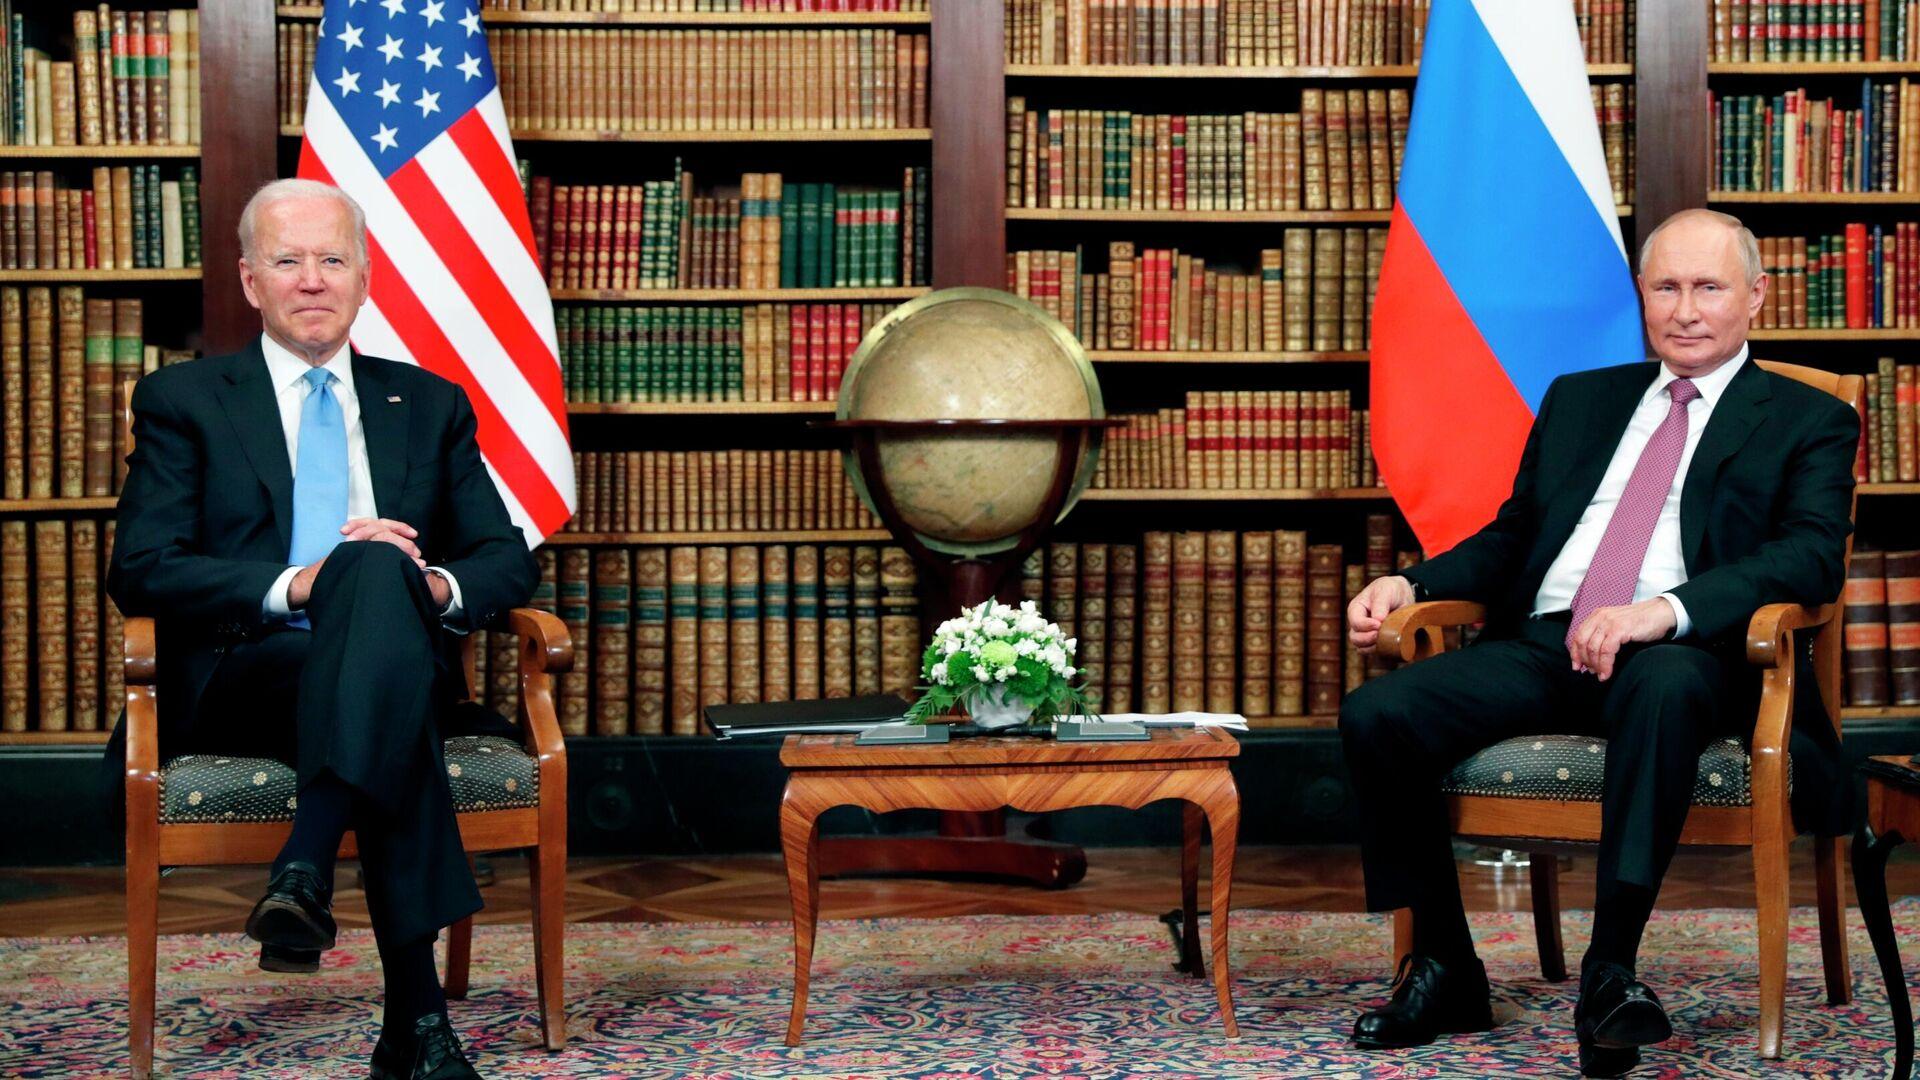 Президент РФ Владимир Путин и президент США Джо Байден во время встречи в Женеве на вилле Ла Гранж - РИА Новости, 1920, 09.07.2021